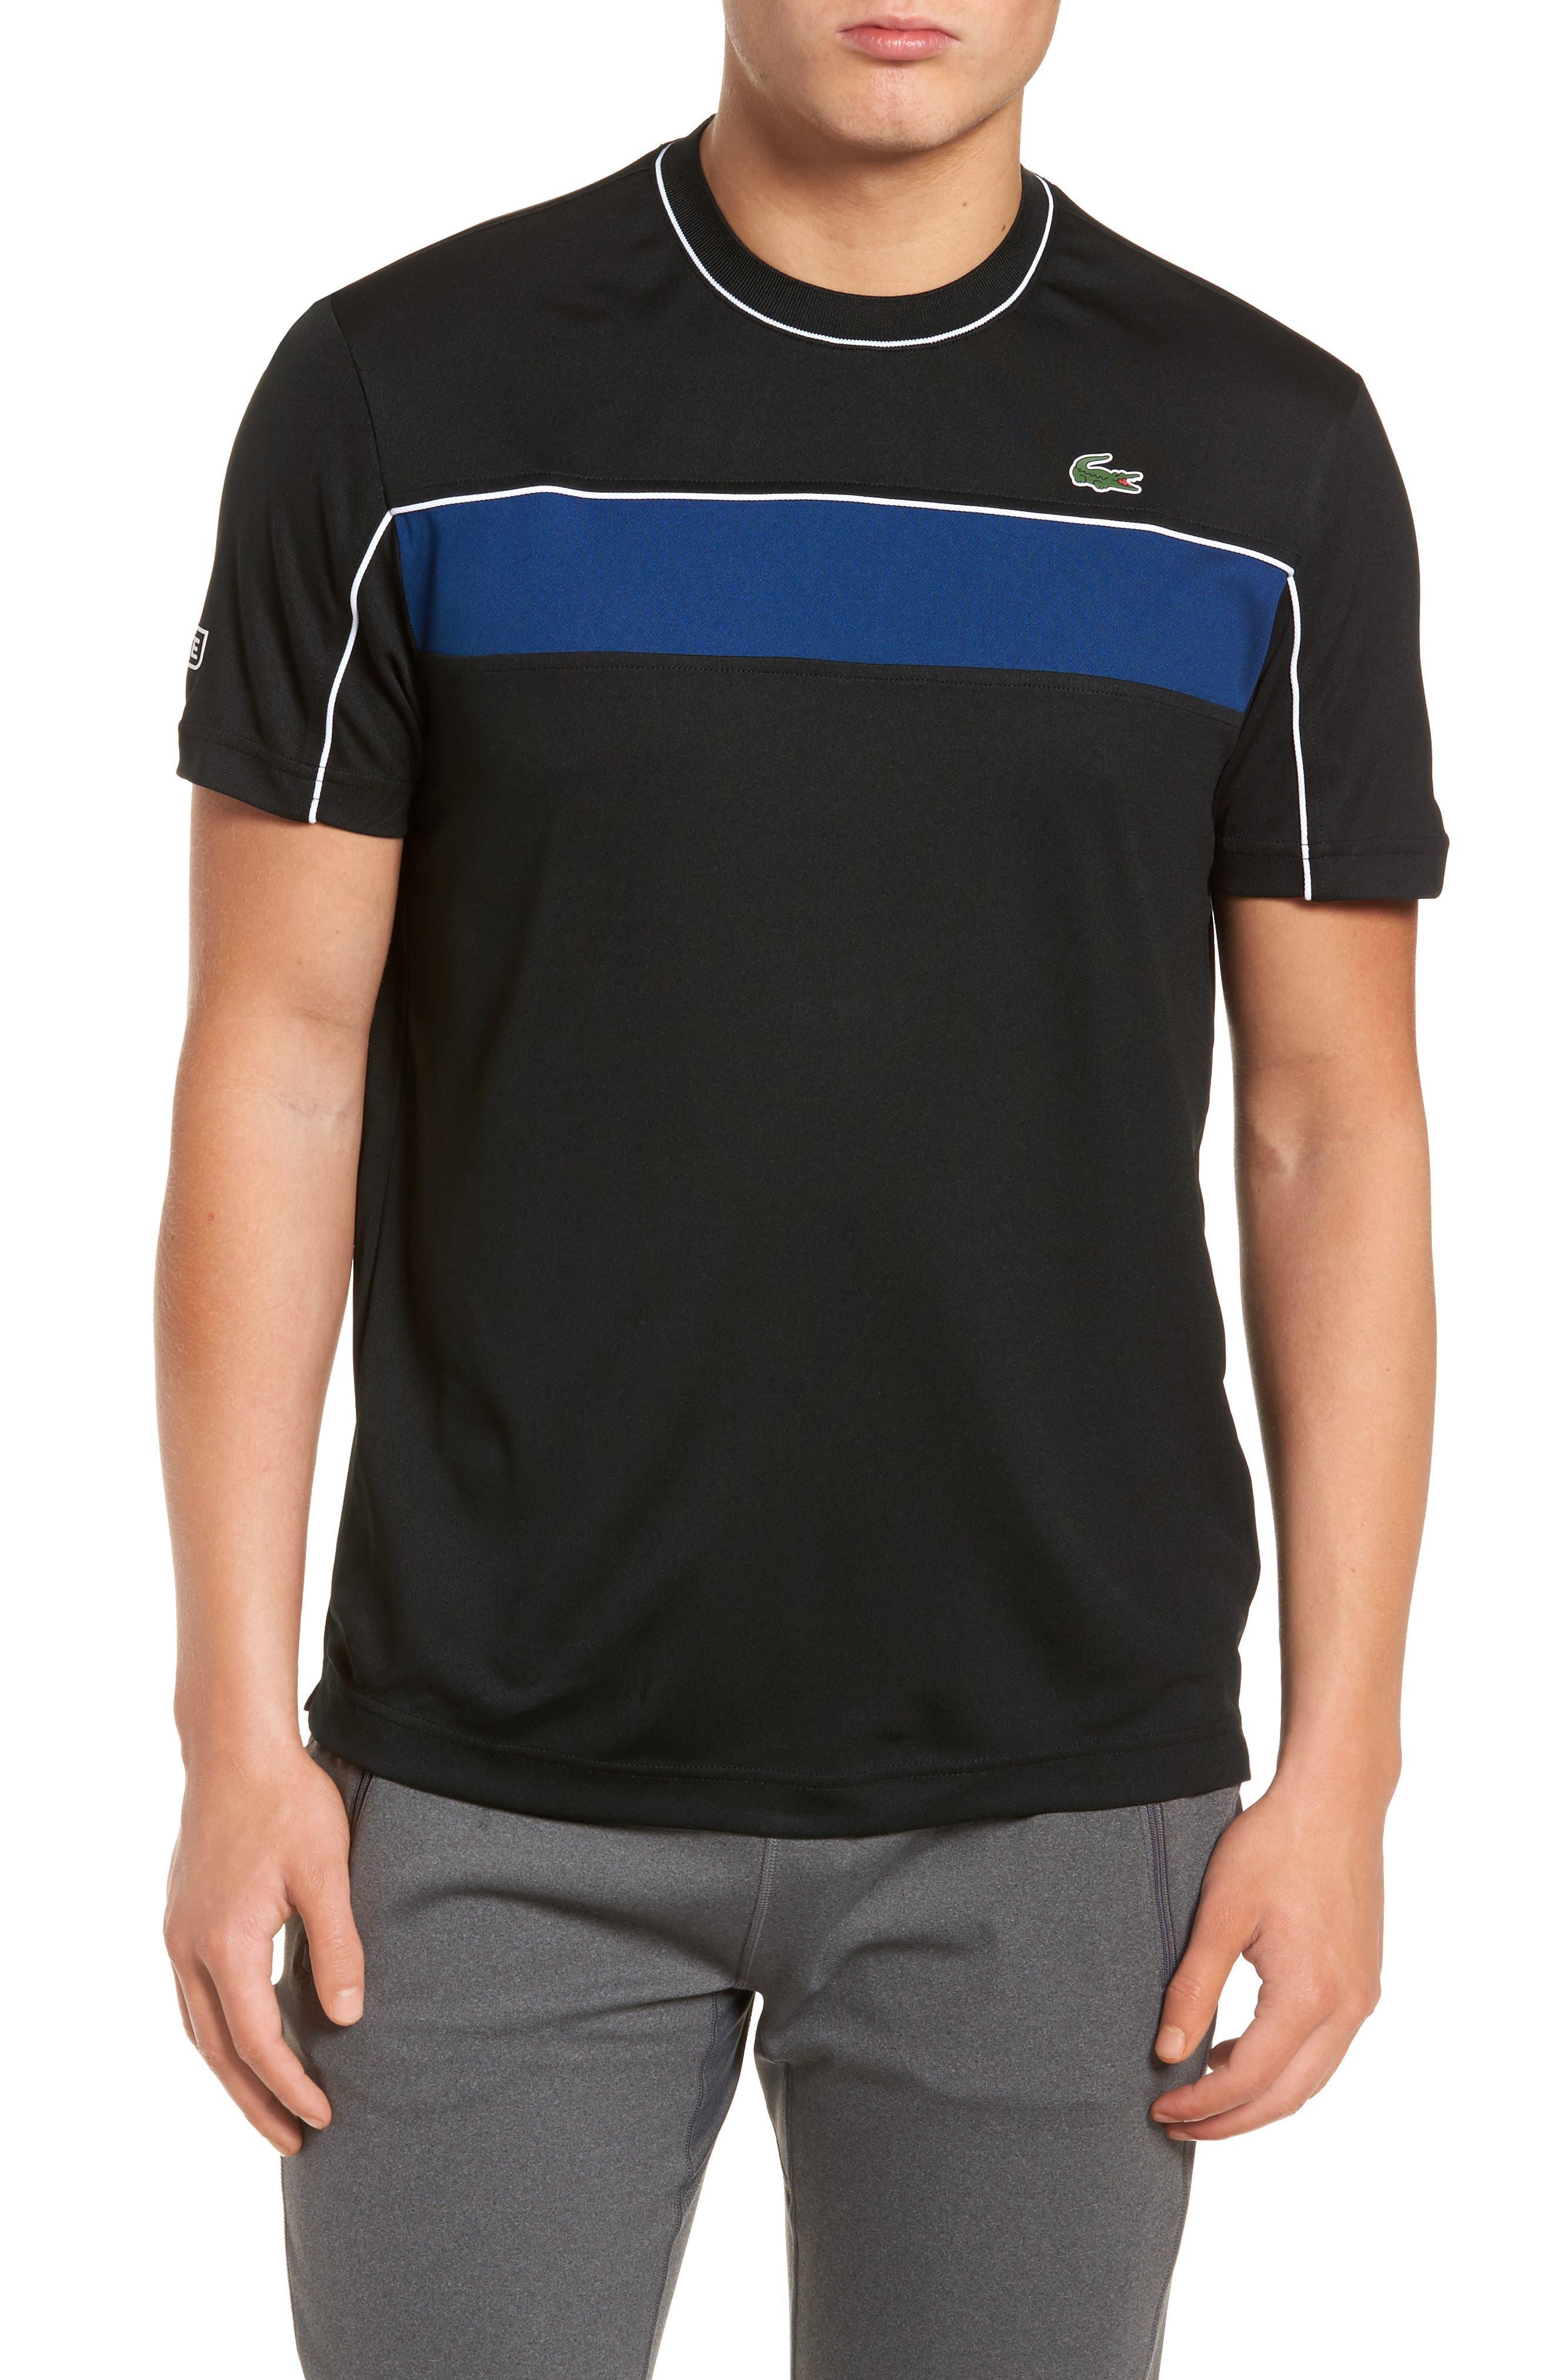 Piqué T-Shirt,                         Main,                         color, BLACK/ MARINO/ WHITE